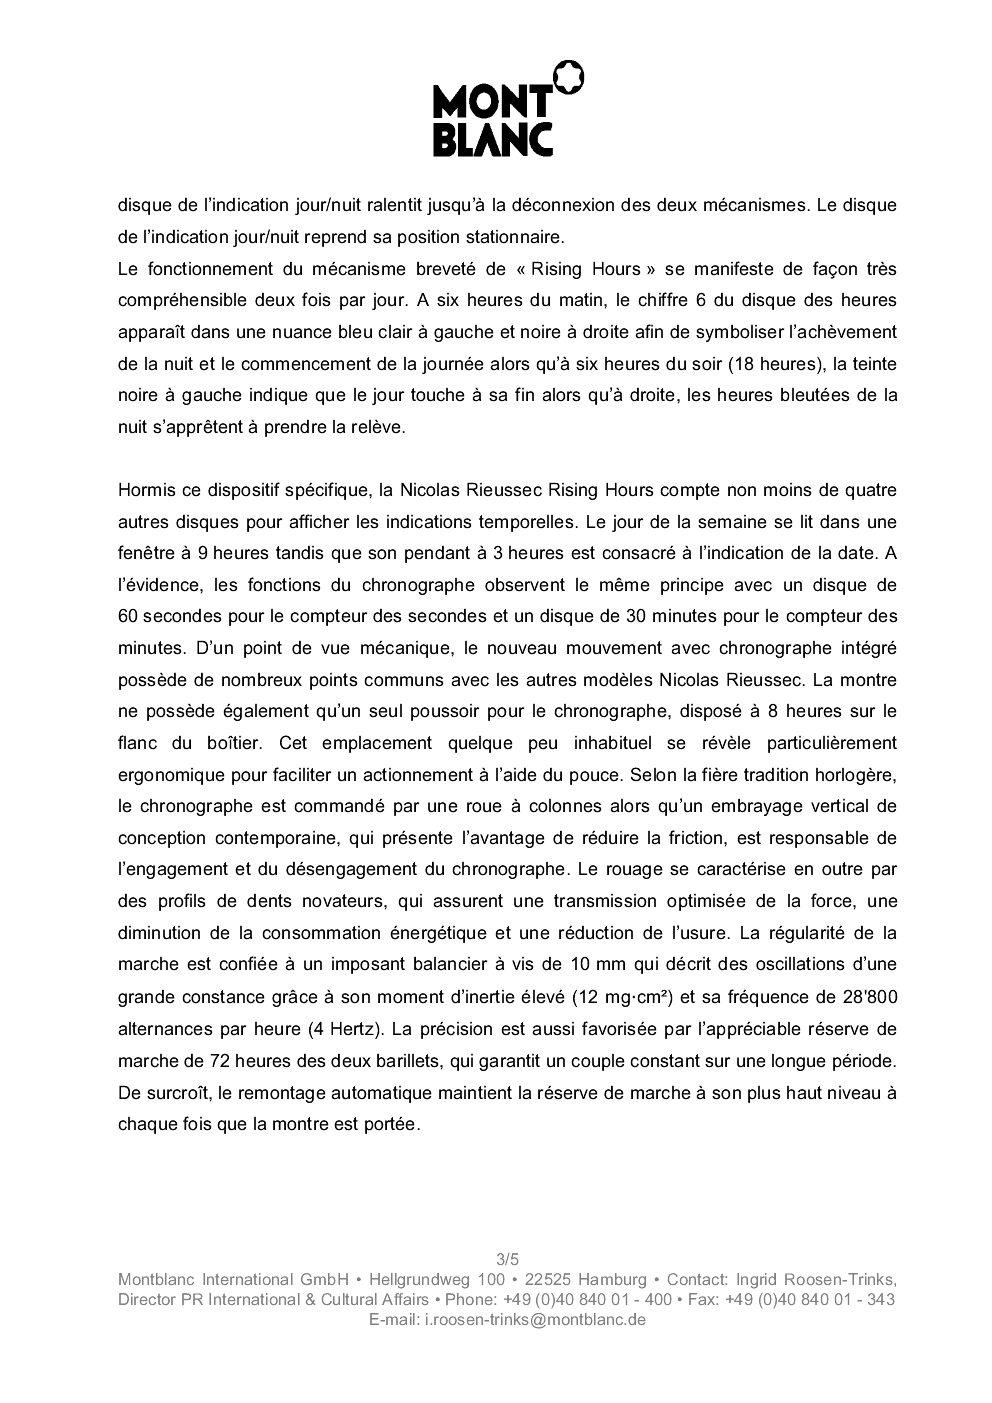 SIHH 2013 MONTBLANC Nicolas RIEUSSEC Rising Hours 345fq0l